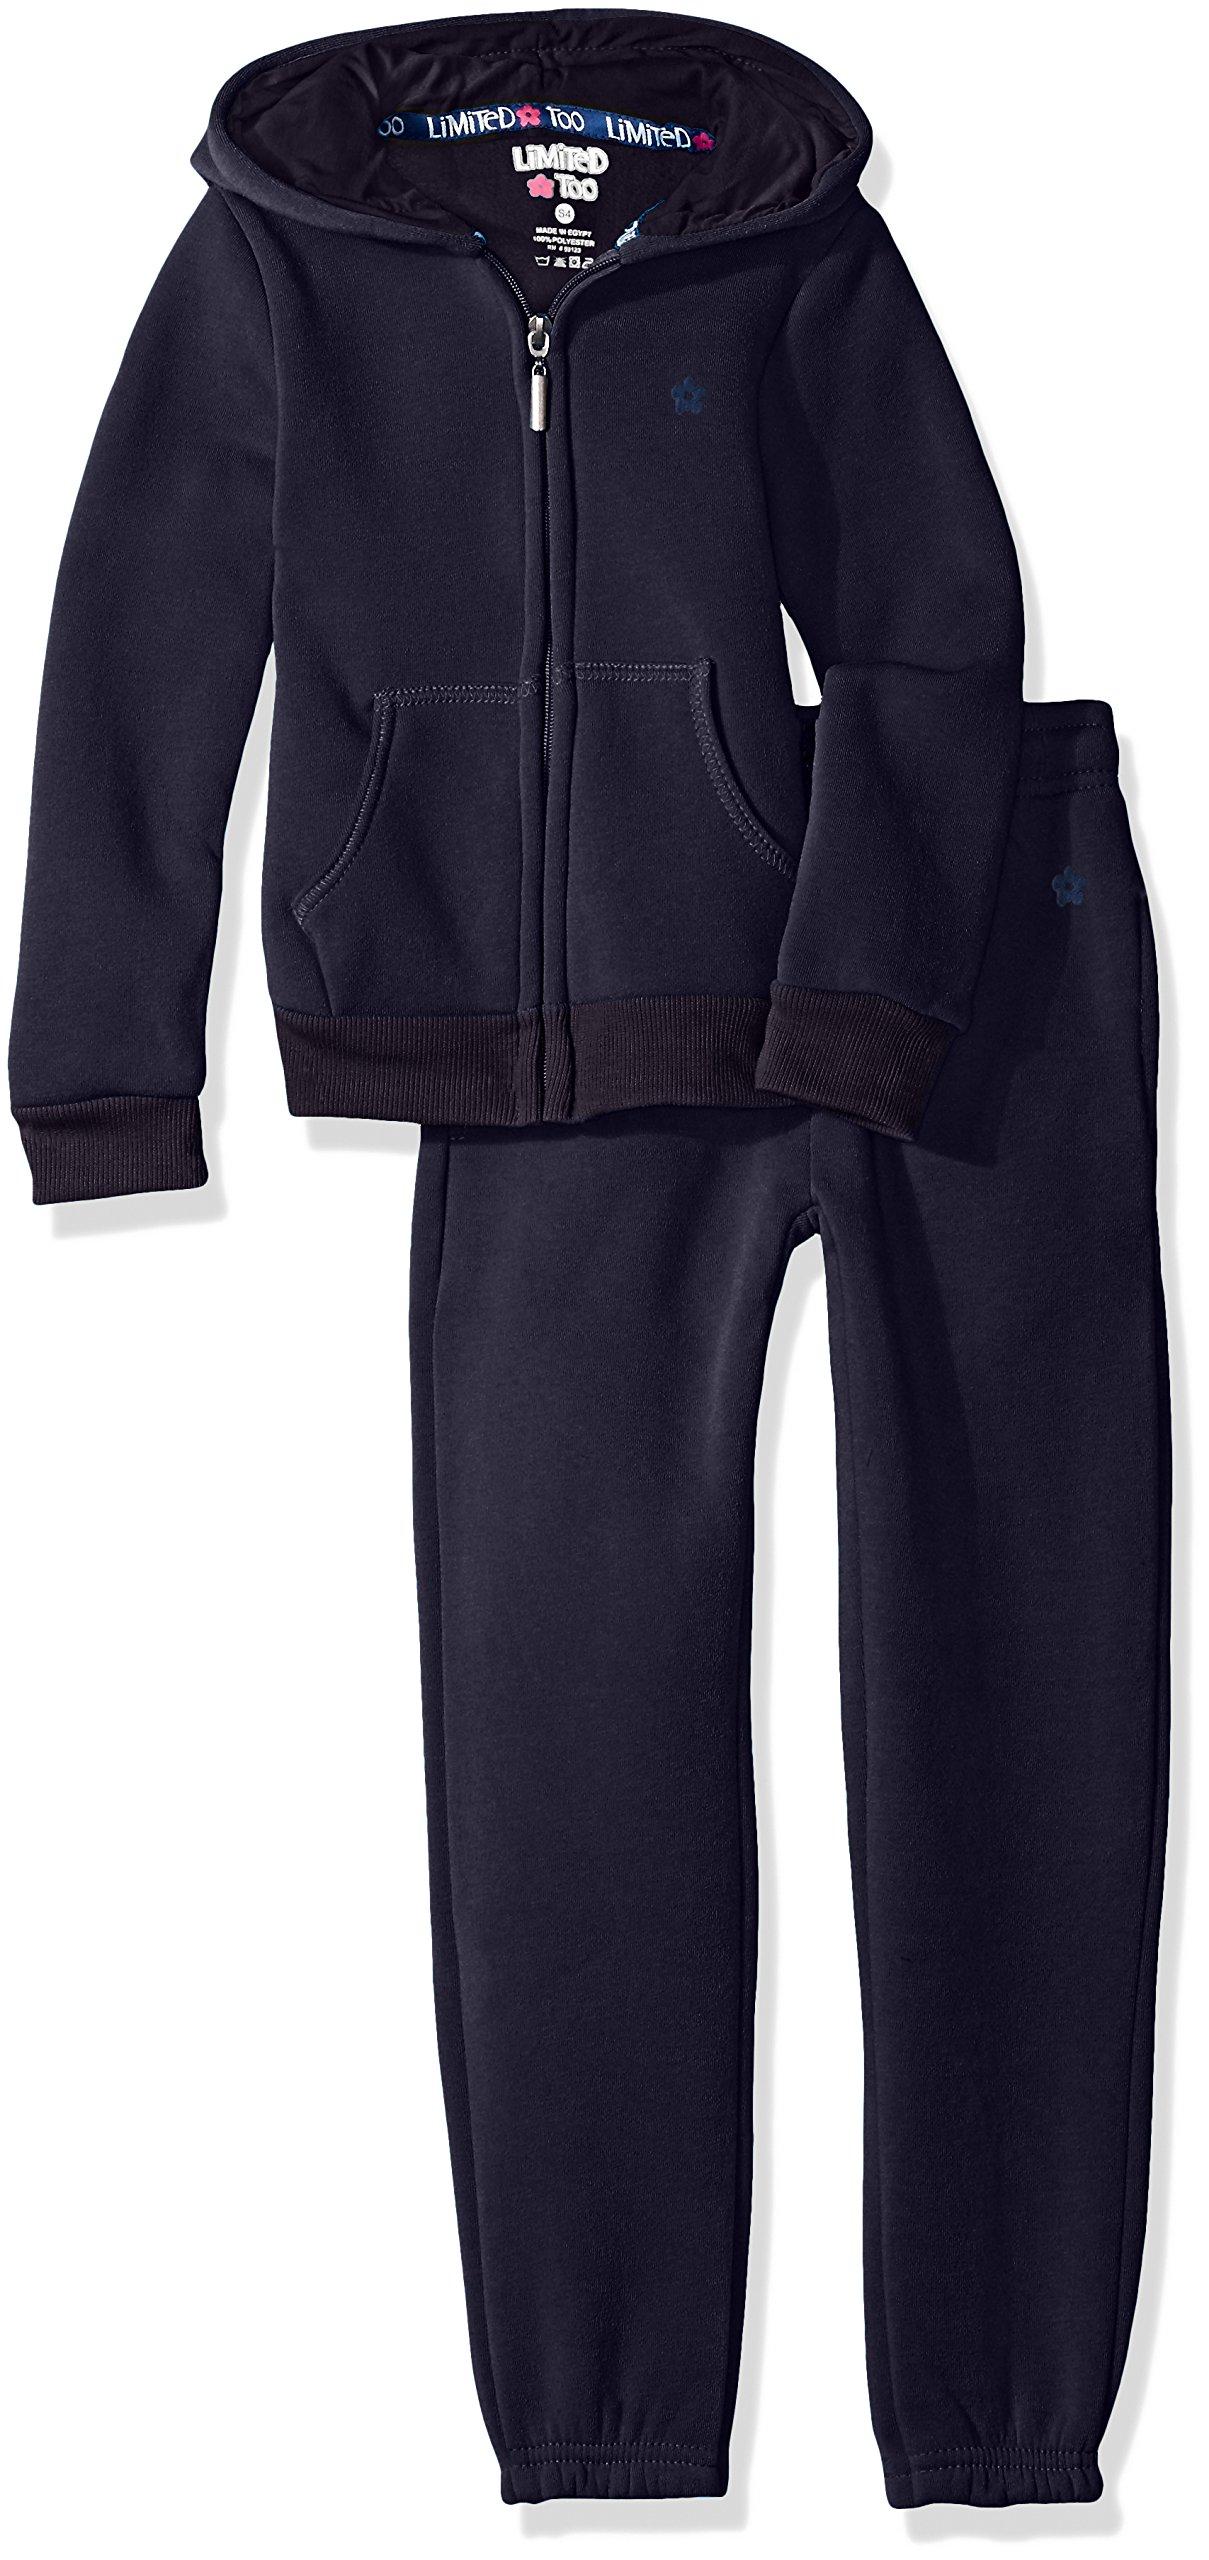 Limited Too Little Girls' Fleece Hoodie Jacket Pant Jog Set, Navy, 6X